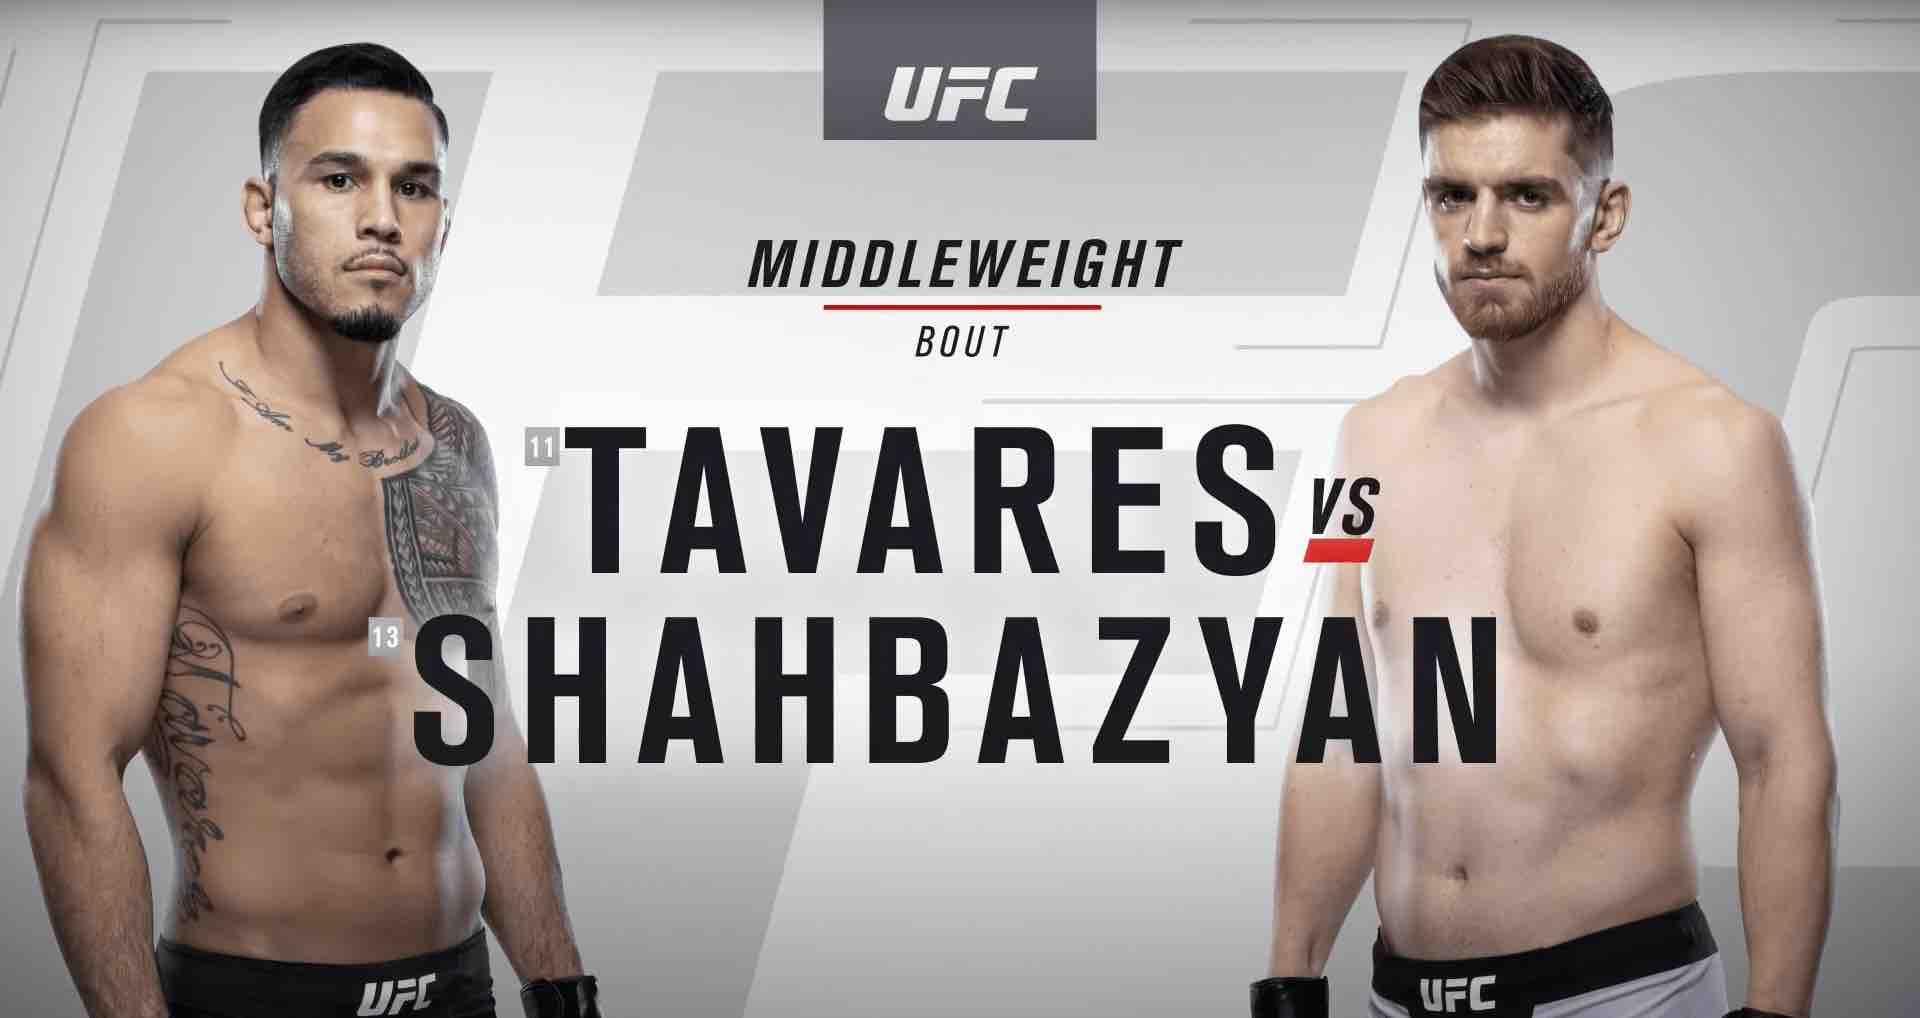 Watch: UFC 244 free fight – Edmen Shahbazyan vs. Brad Tavares